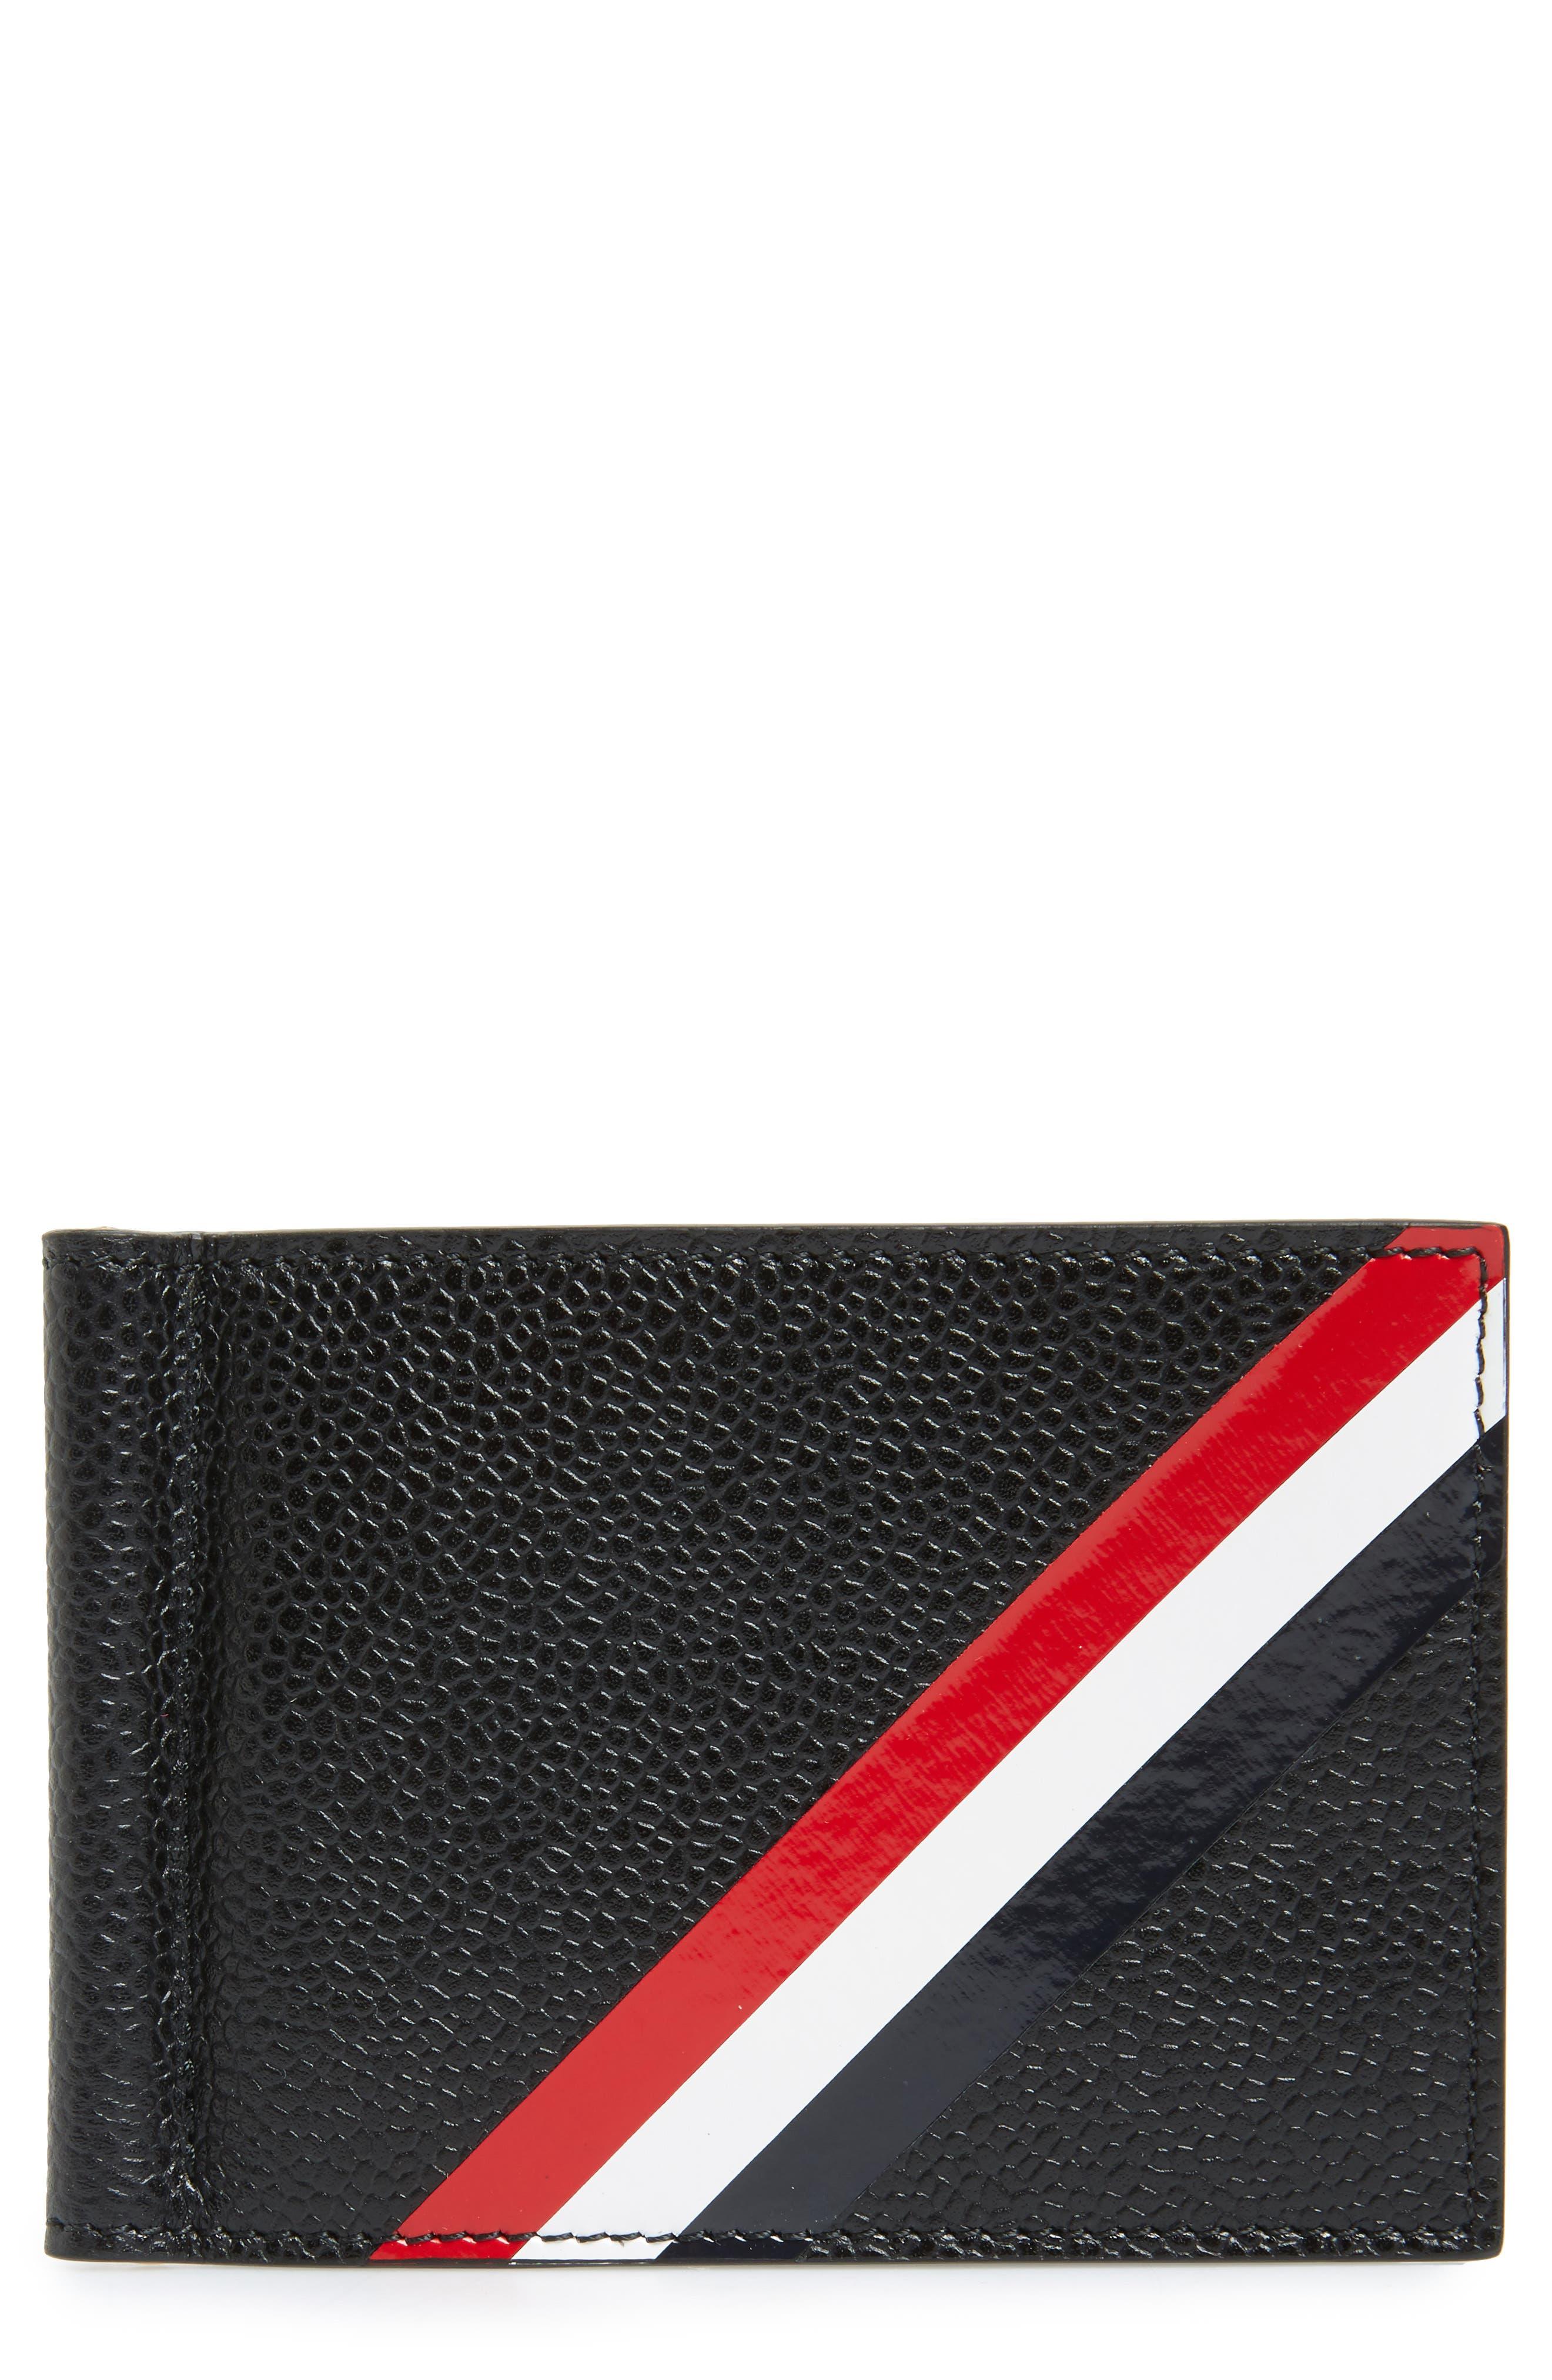 Alternate Image 1 Selected - Thom Browne Diagonal Stripe Leather Card Holder